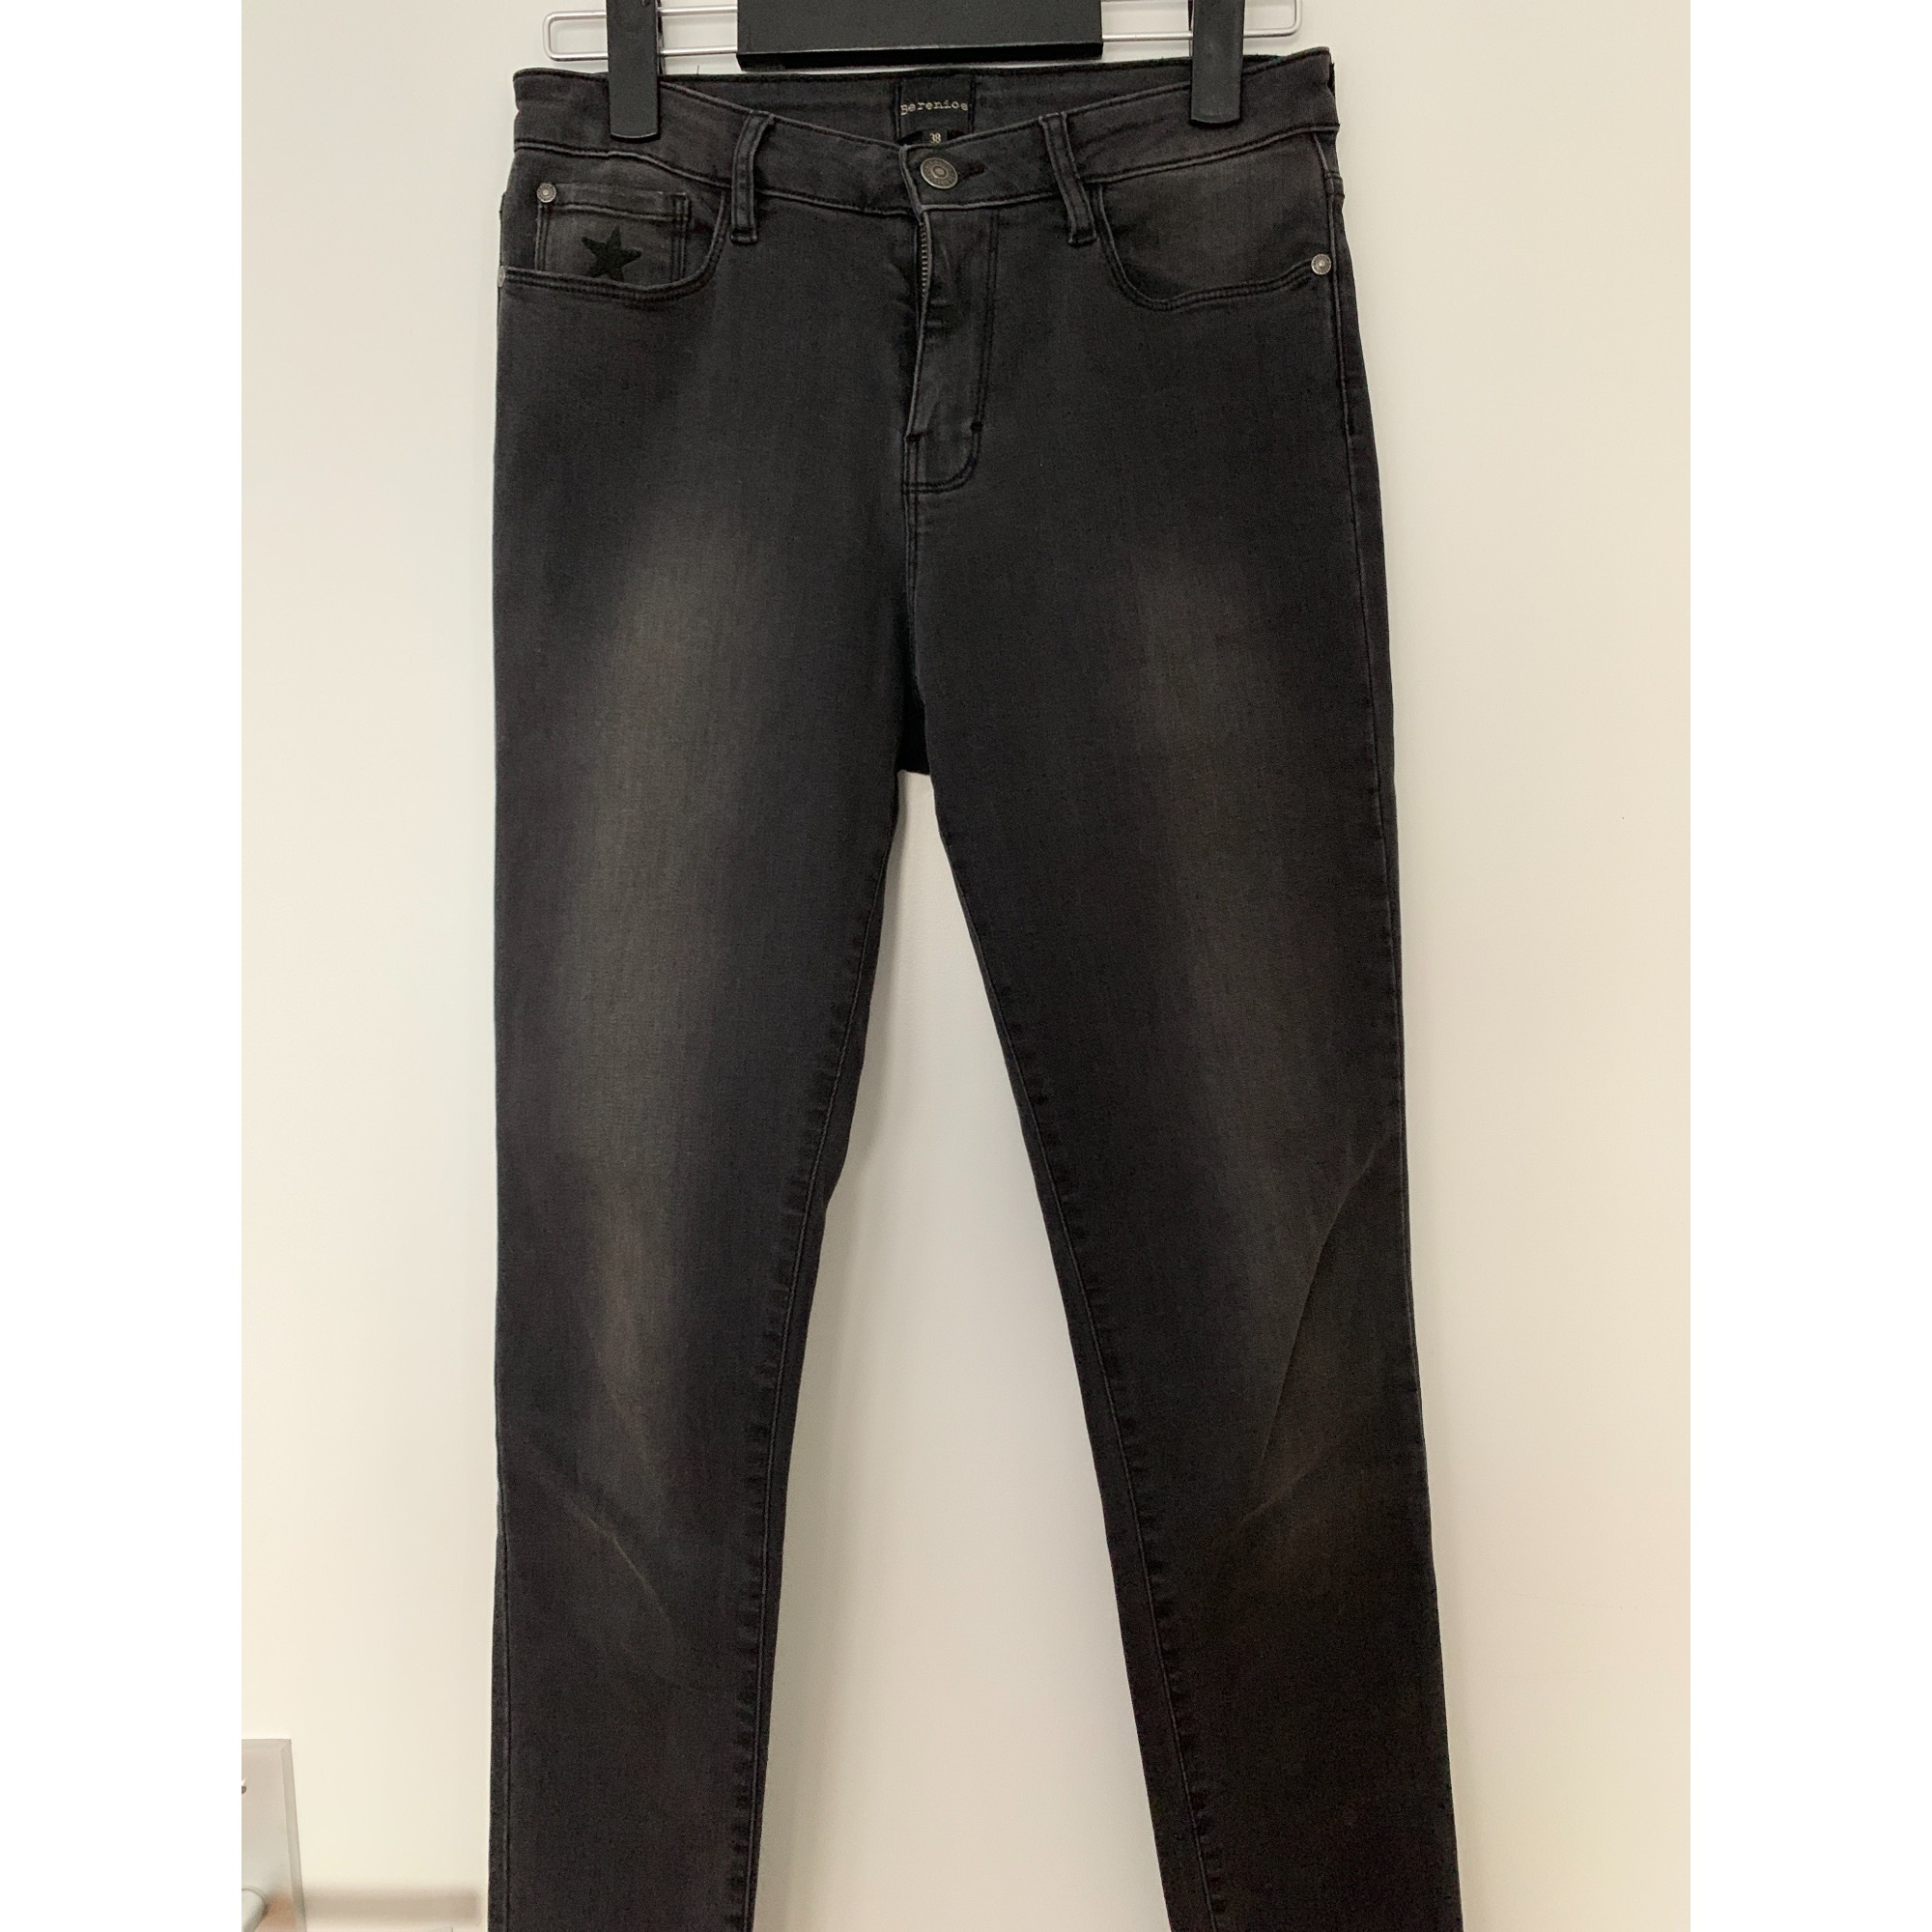 Jeans slim BERENICE Gris, anthracite